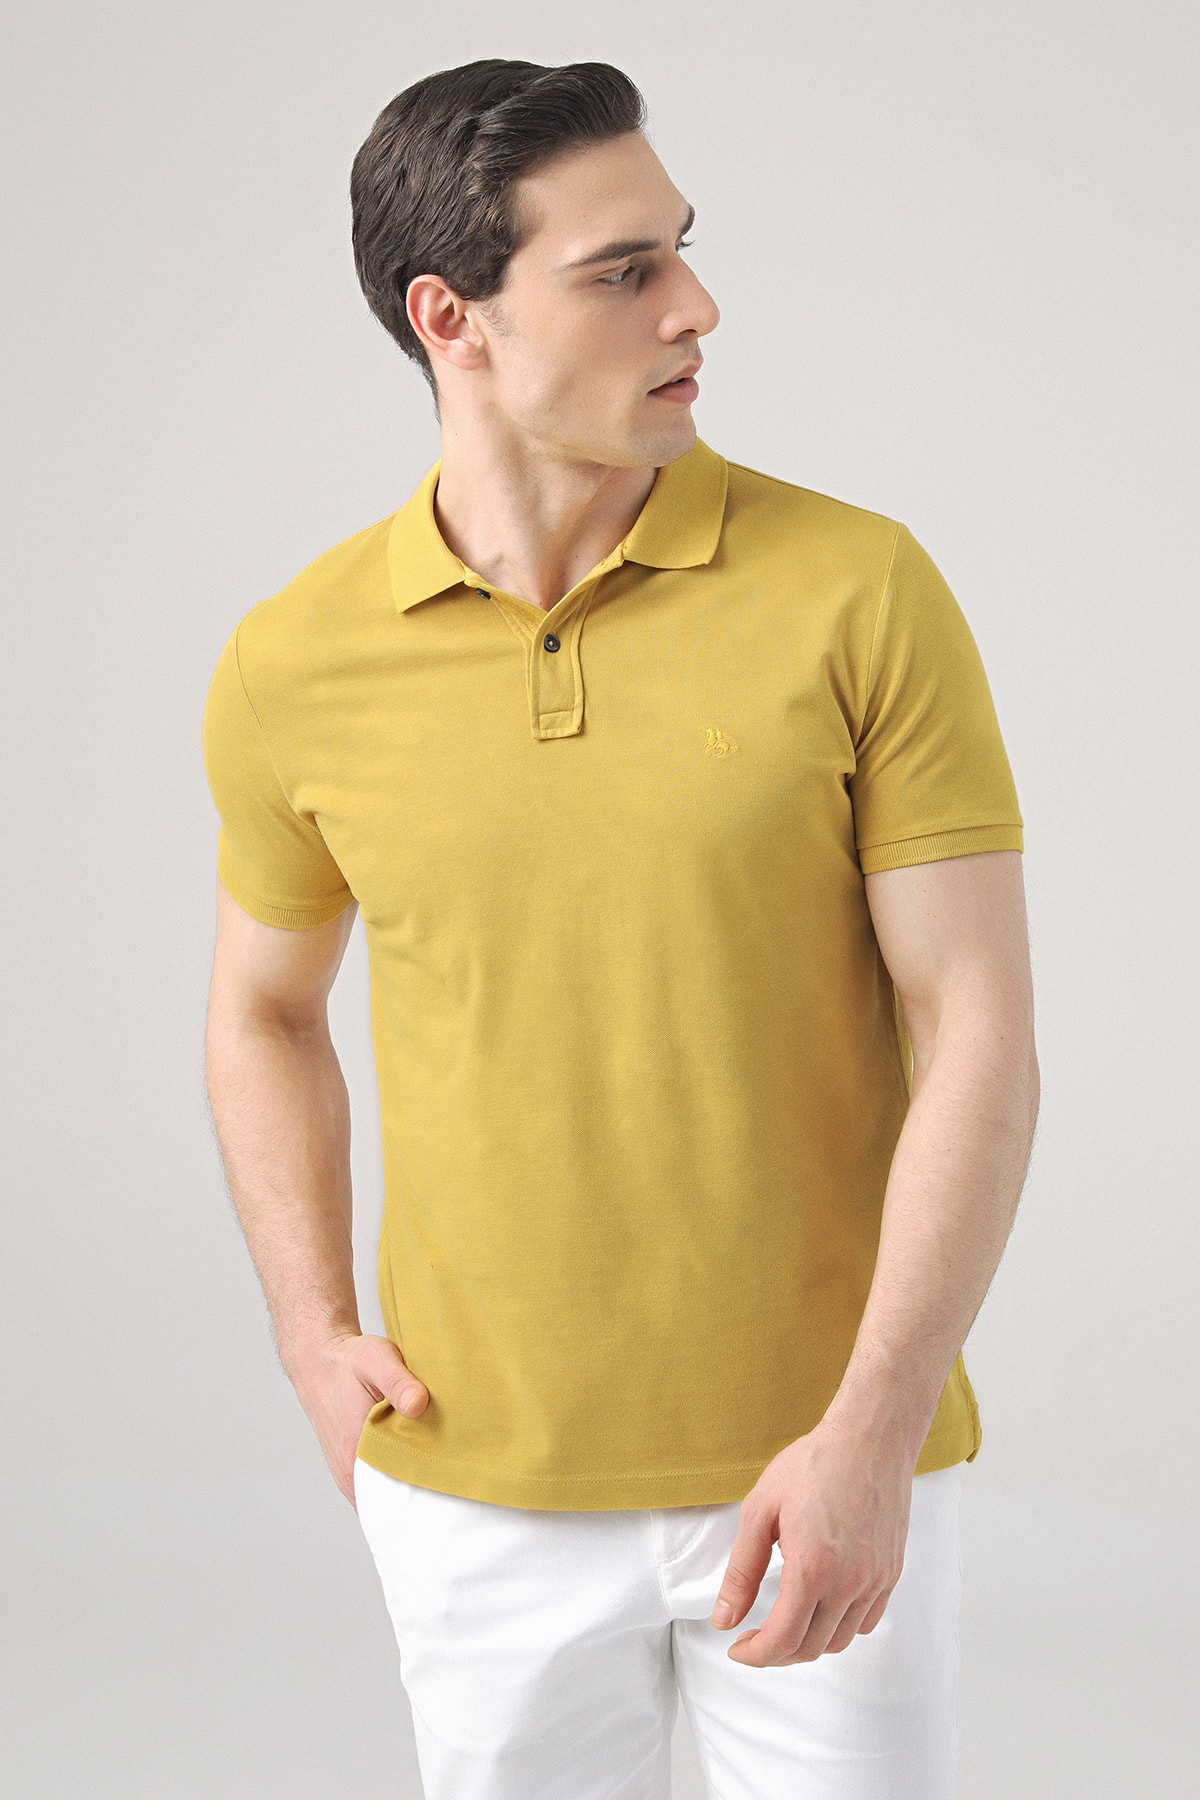 D'S Damat Erkek Safran Rengi Regular Fit Pike Dokulu T-shirt 1